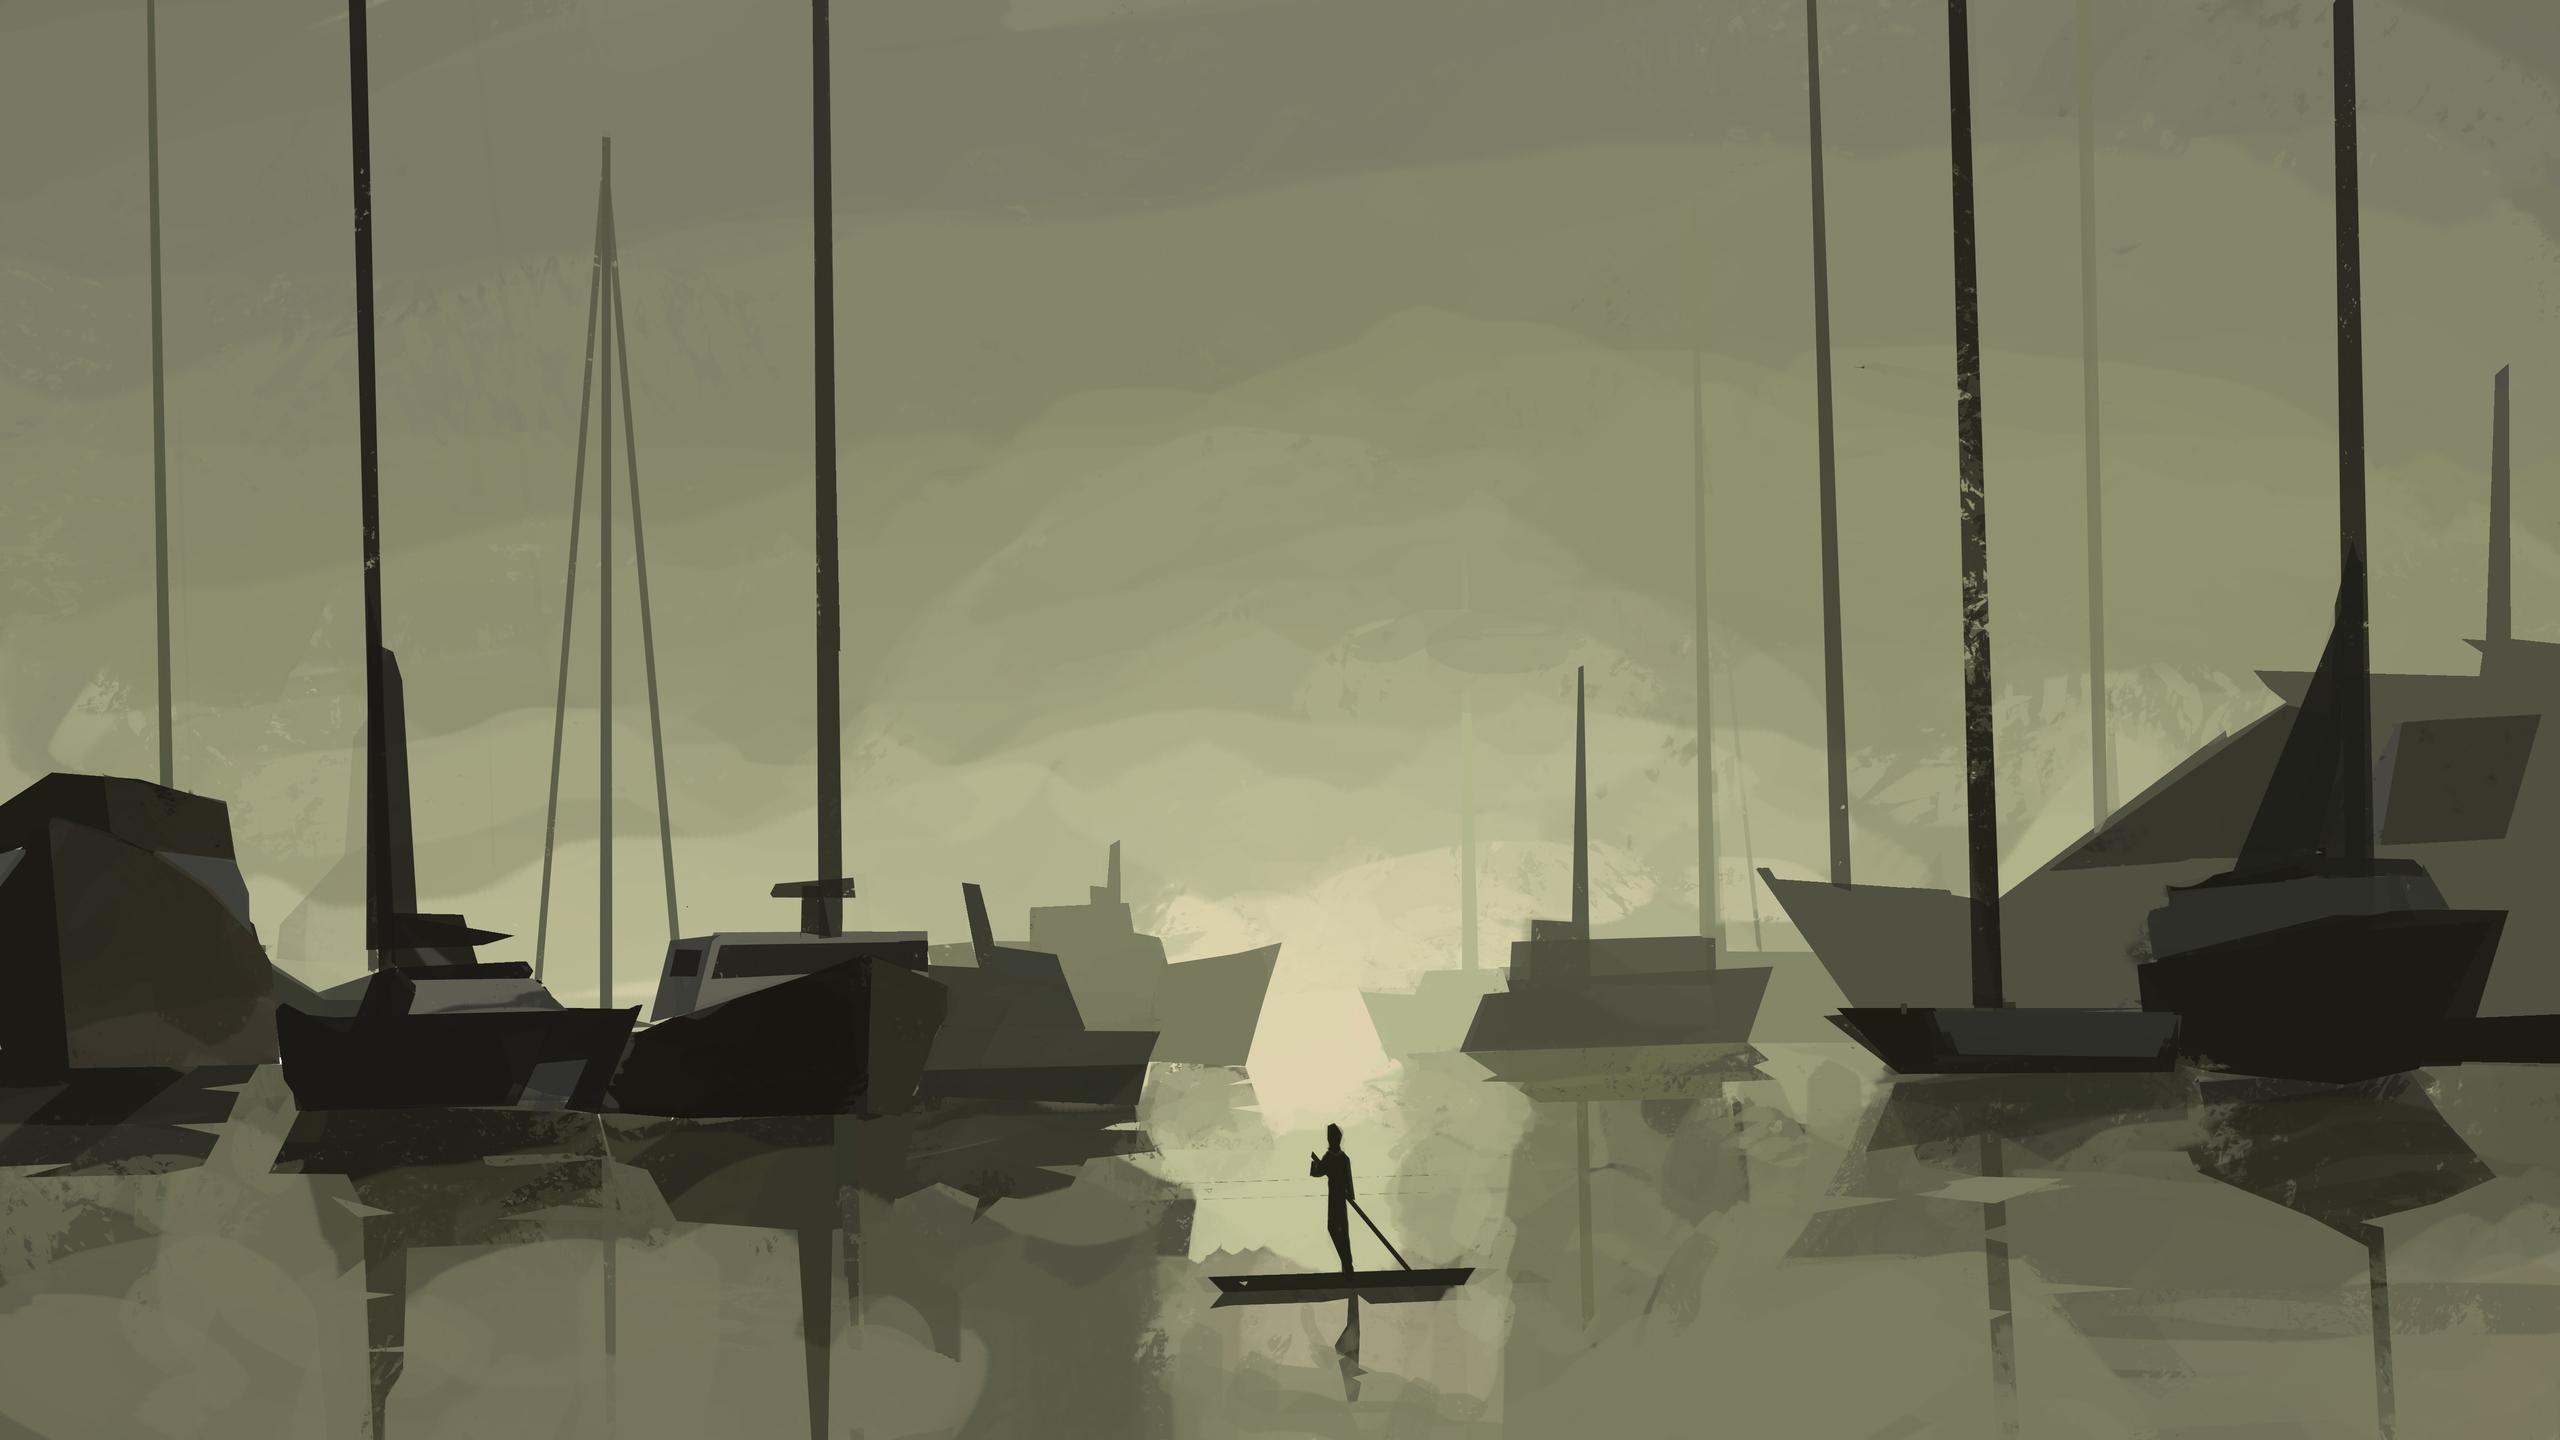 , boats, sailboats, Dock - brentsievers   ello